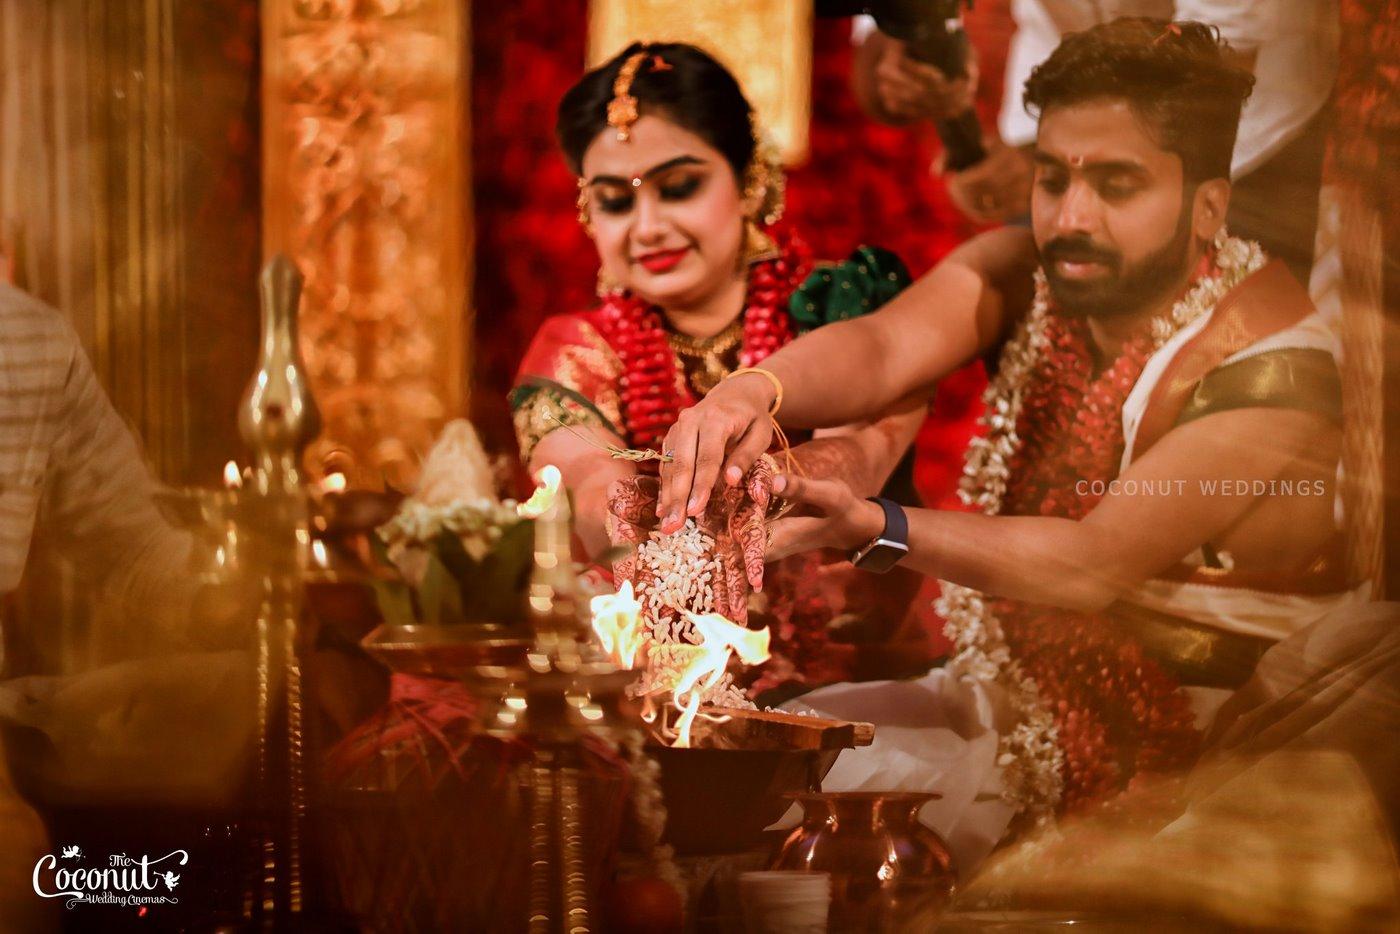 vidhya unni wedding photos 4